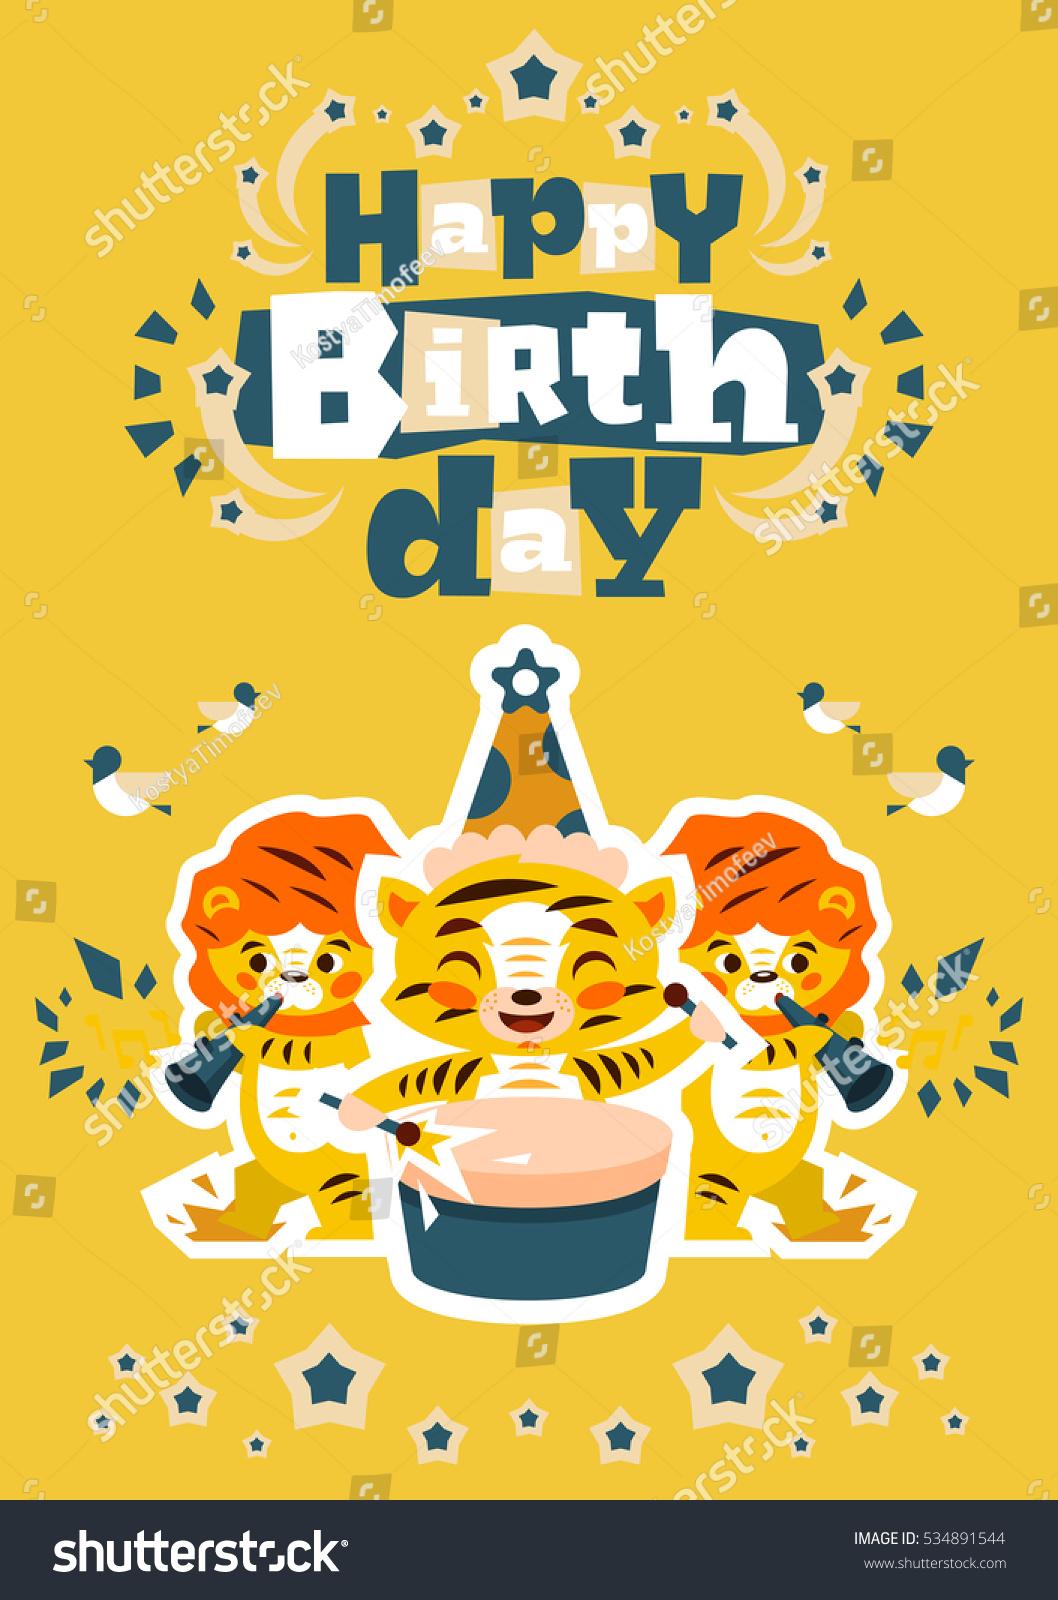 Greeting Card Happy Birthday Designed Printing Stock Vector